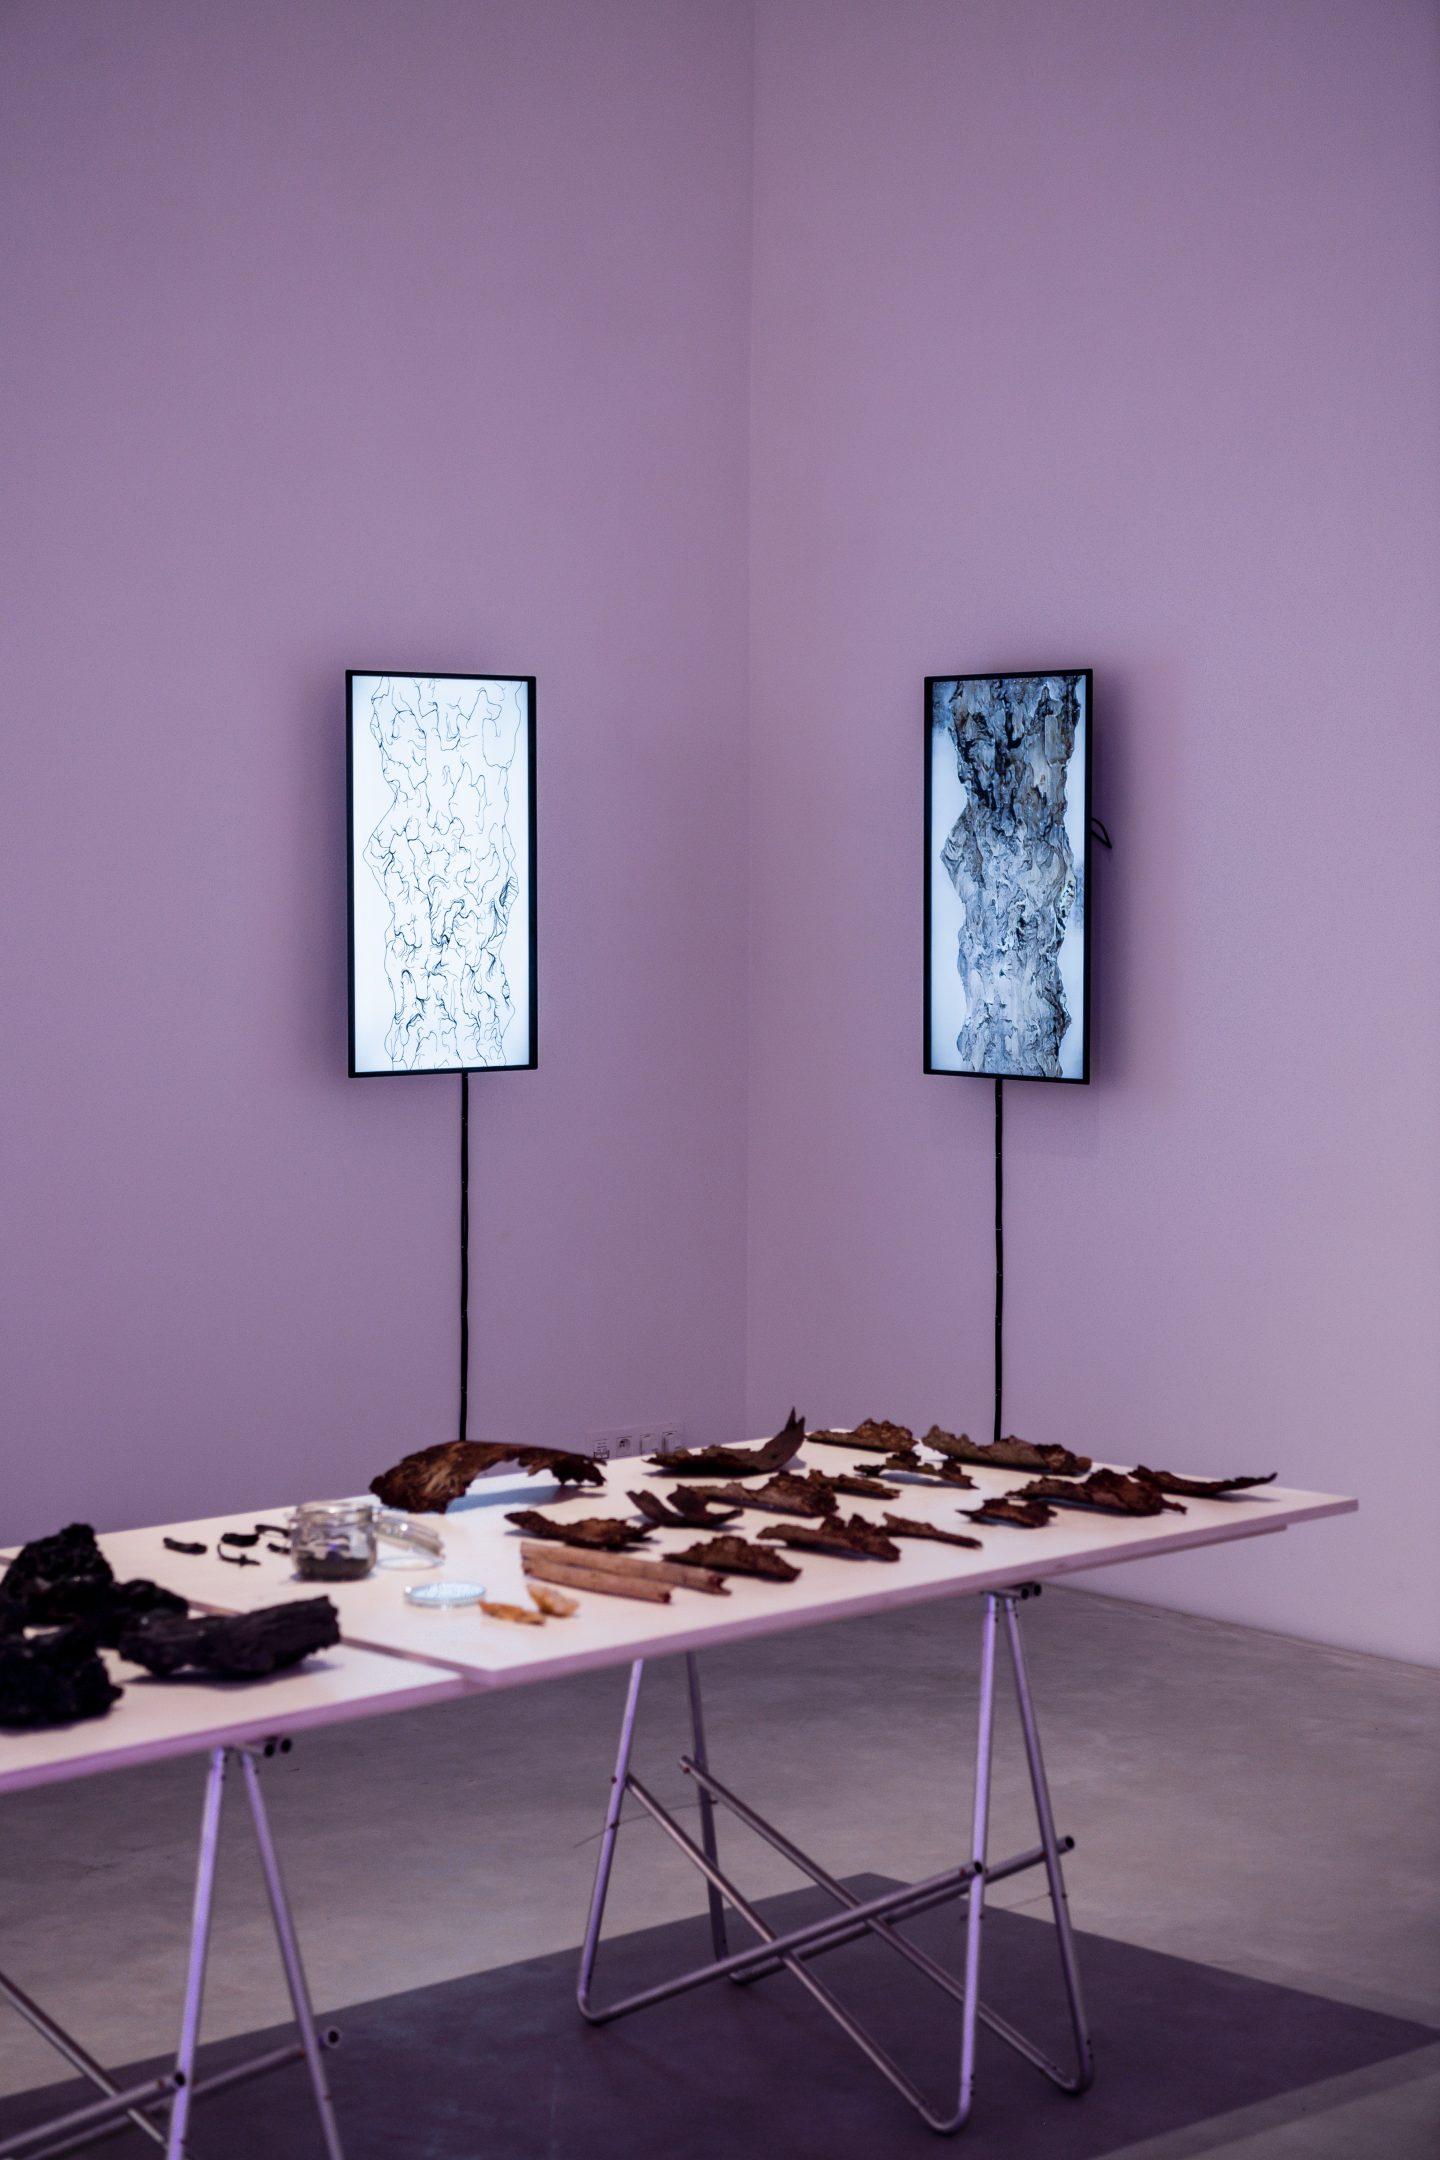 Kristof Vrancken, installationview (Hunger of the Pine)2, 2021, Z33, Hasselt. Foto Boumediene Belbachir